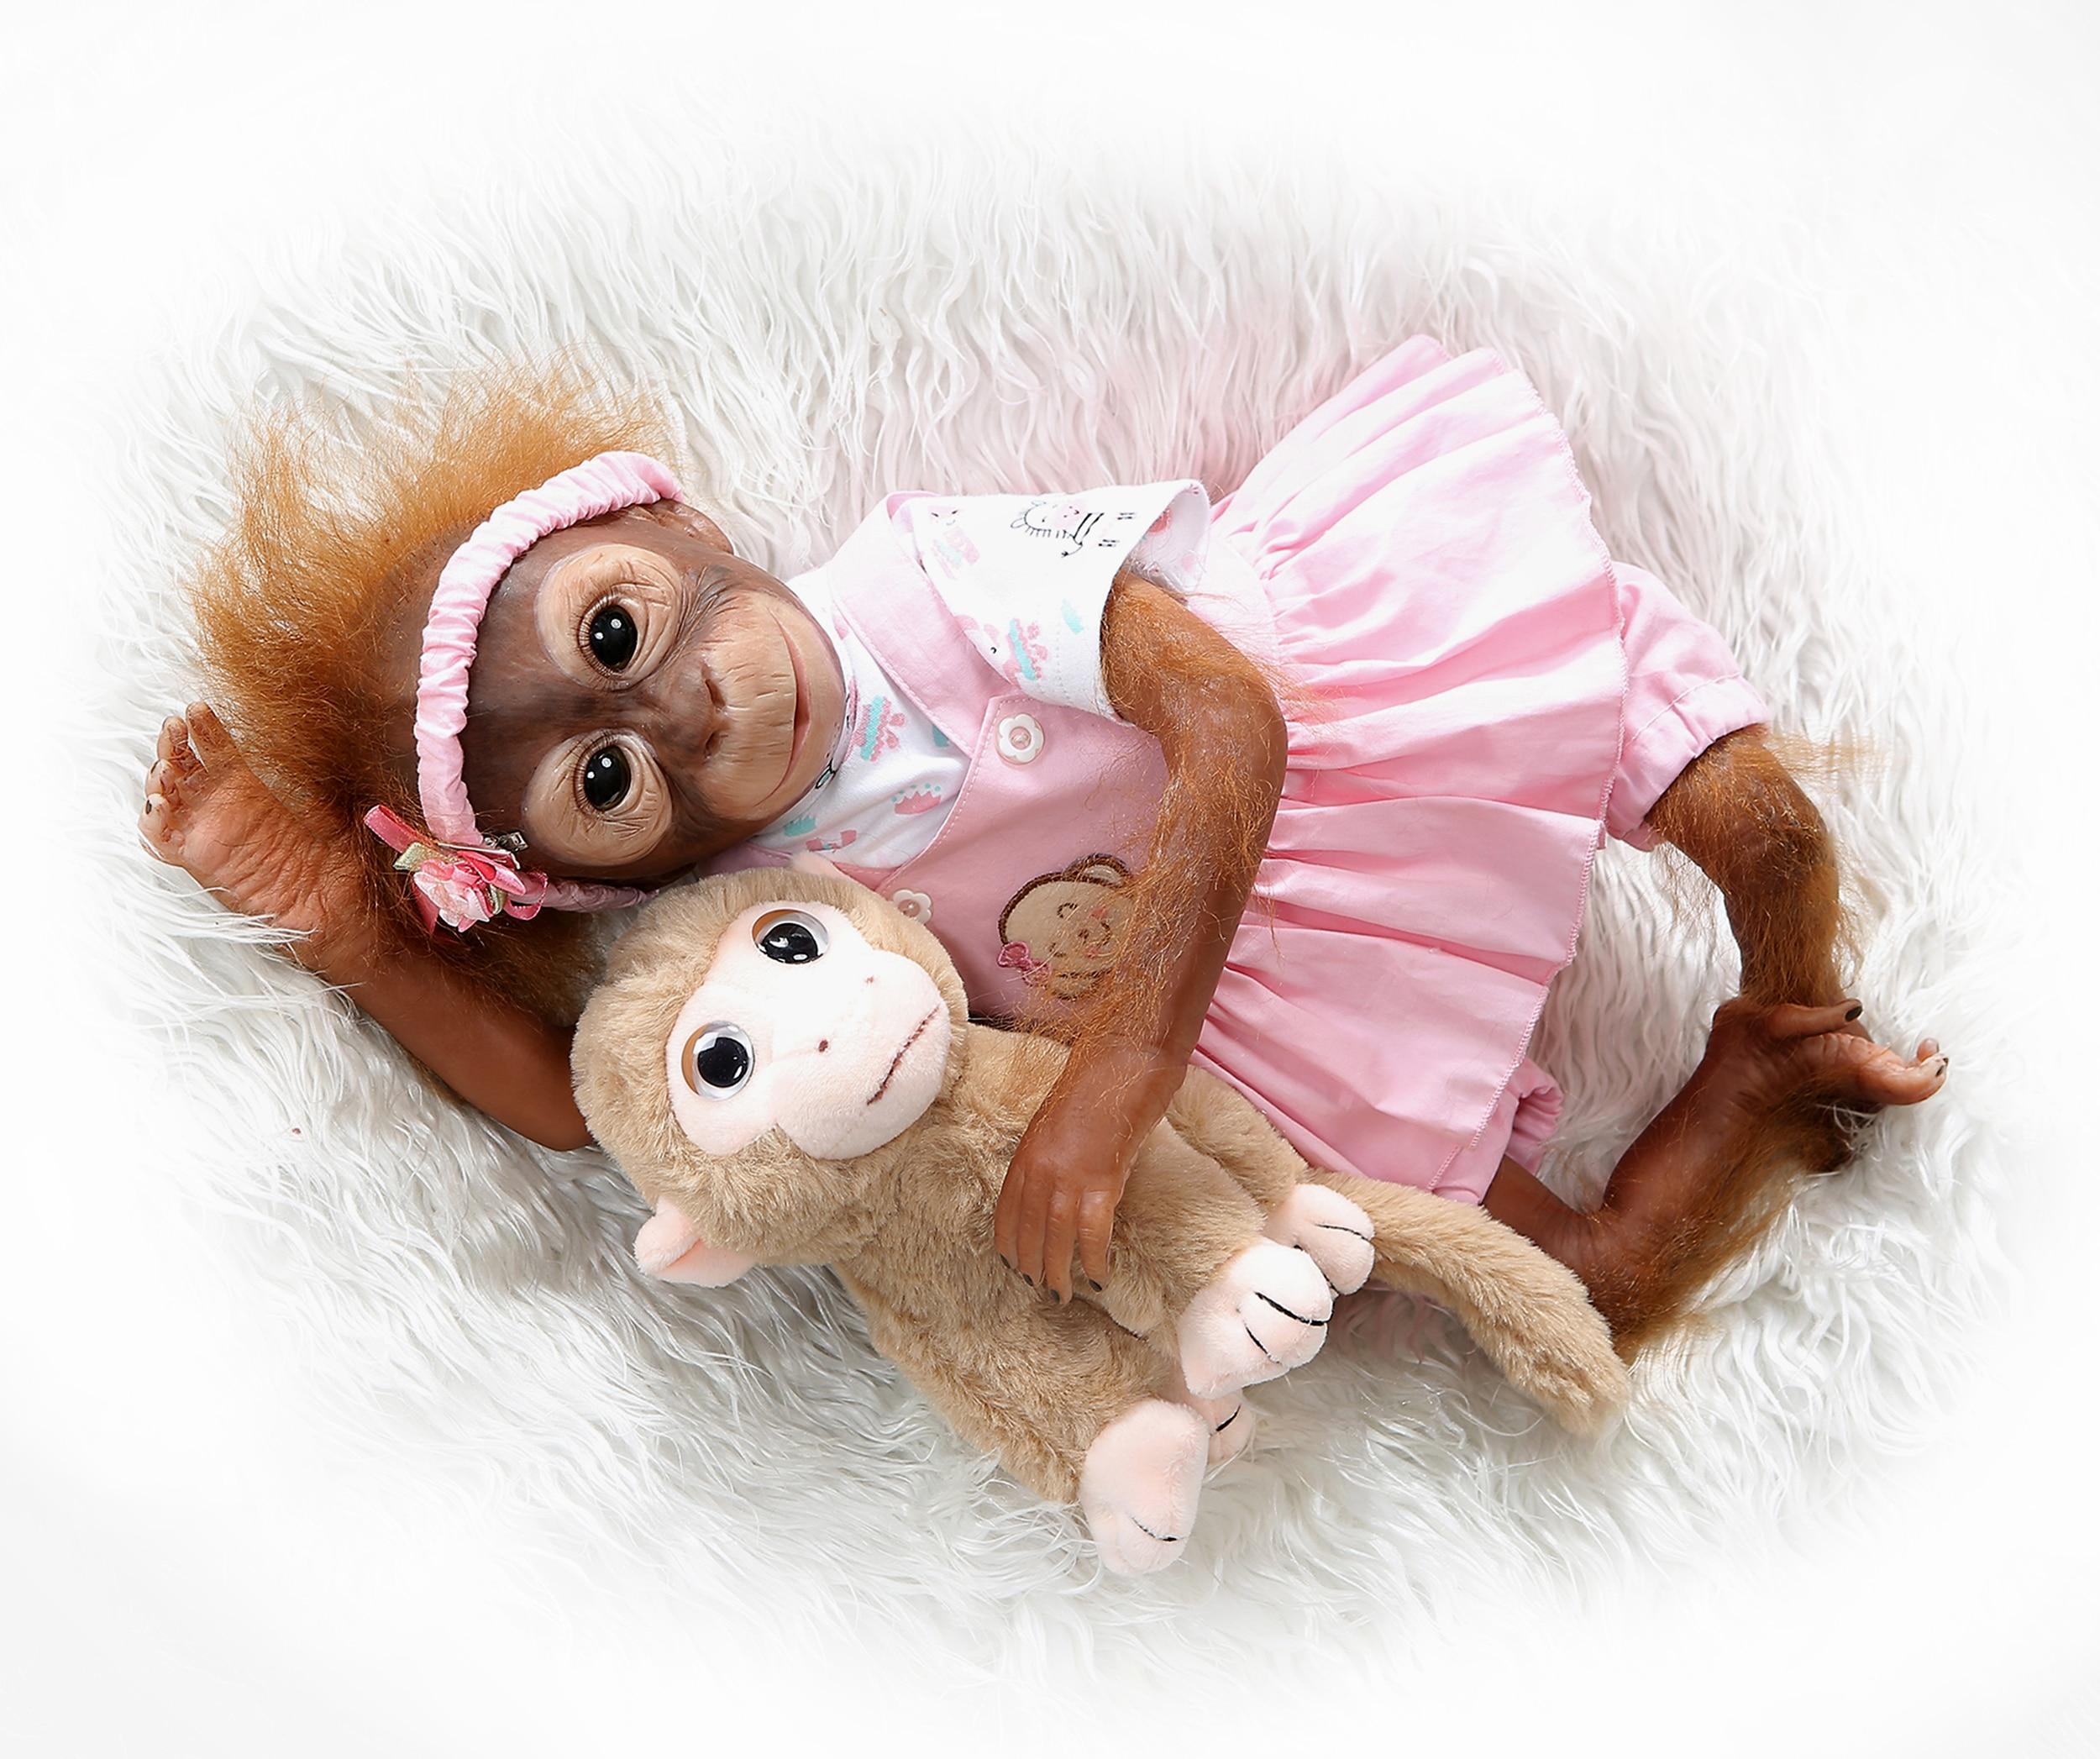 Npkcollection 새로운 52 cm 수제 상세한 페인트 reborn 아기 원숭이 신생아 아기 인형 collectible art 고품질-에서인형부터 완구 & 취미 의  그룹 1